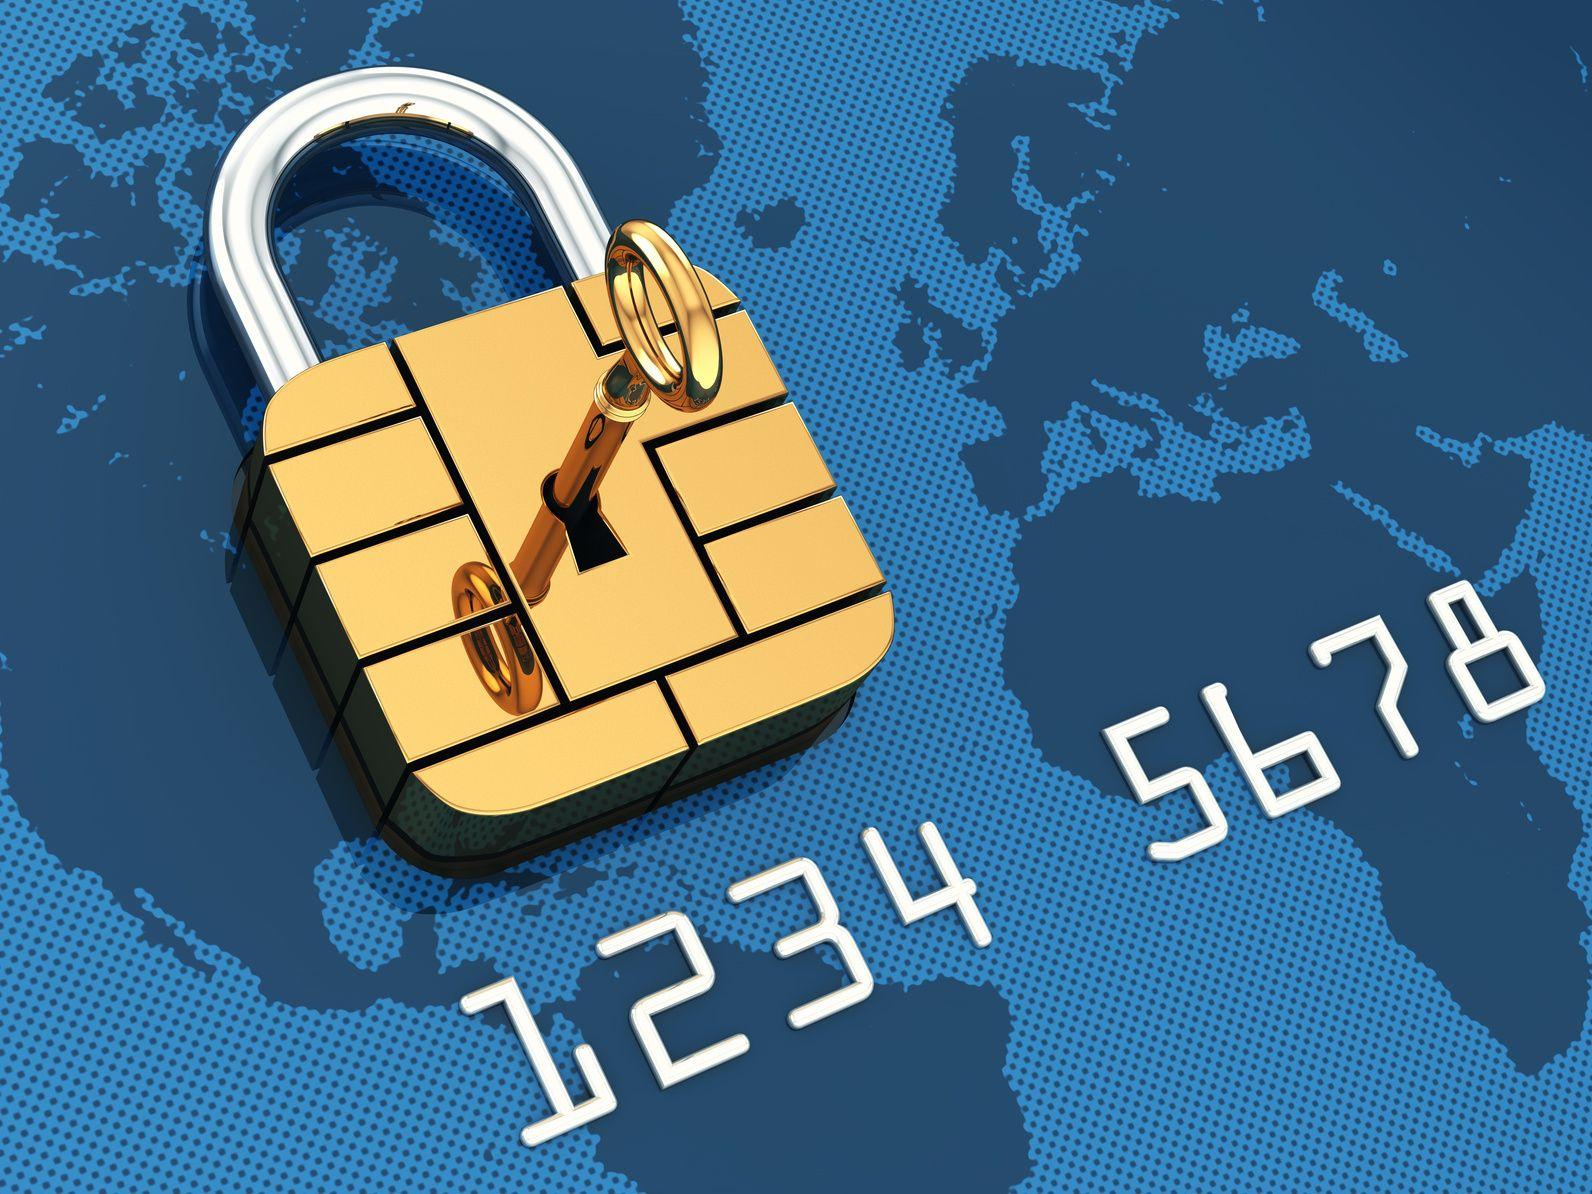 Меры безопасности Совкомбанк онлайн